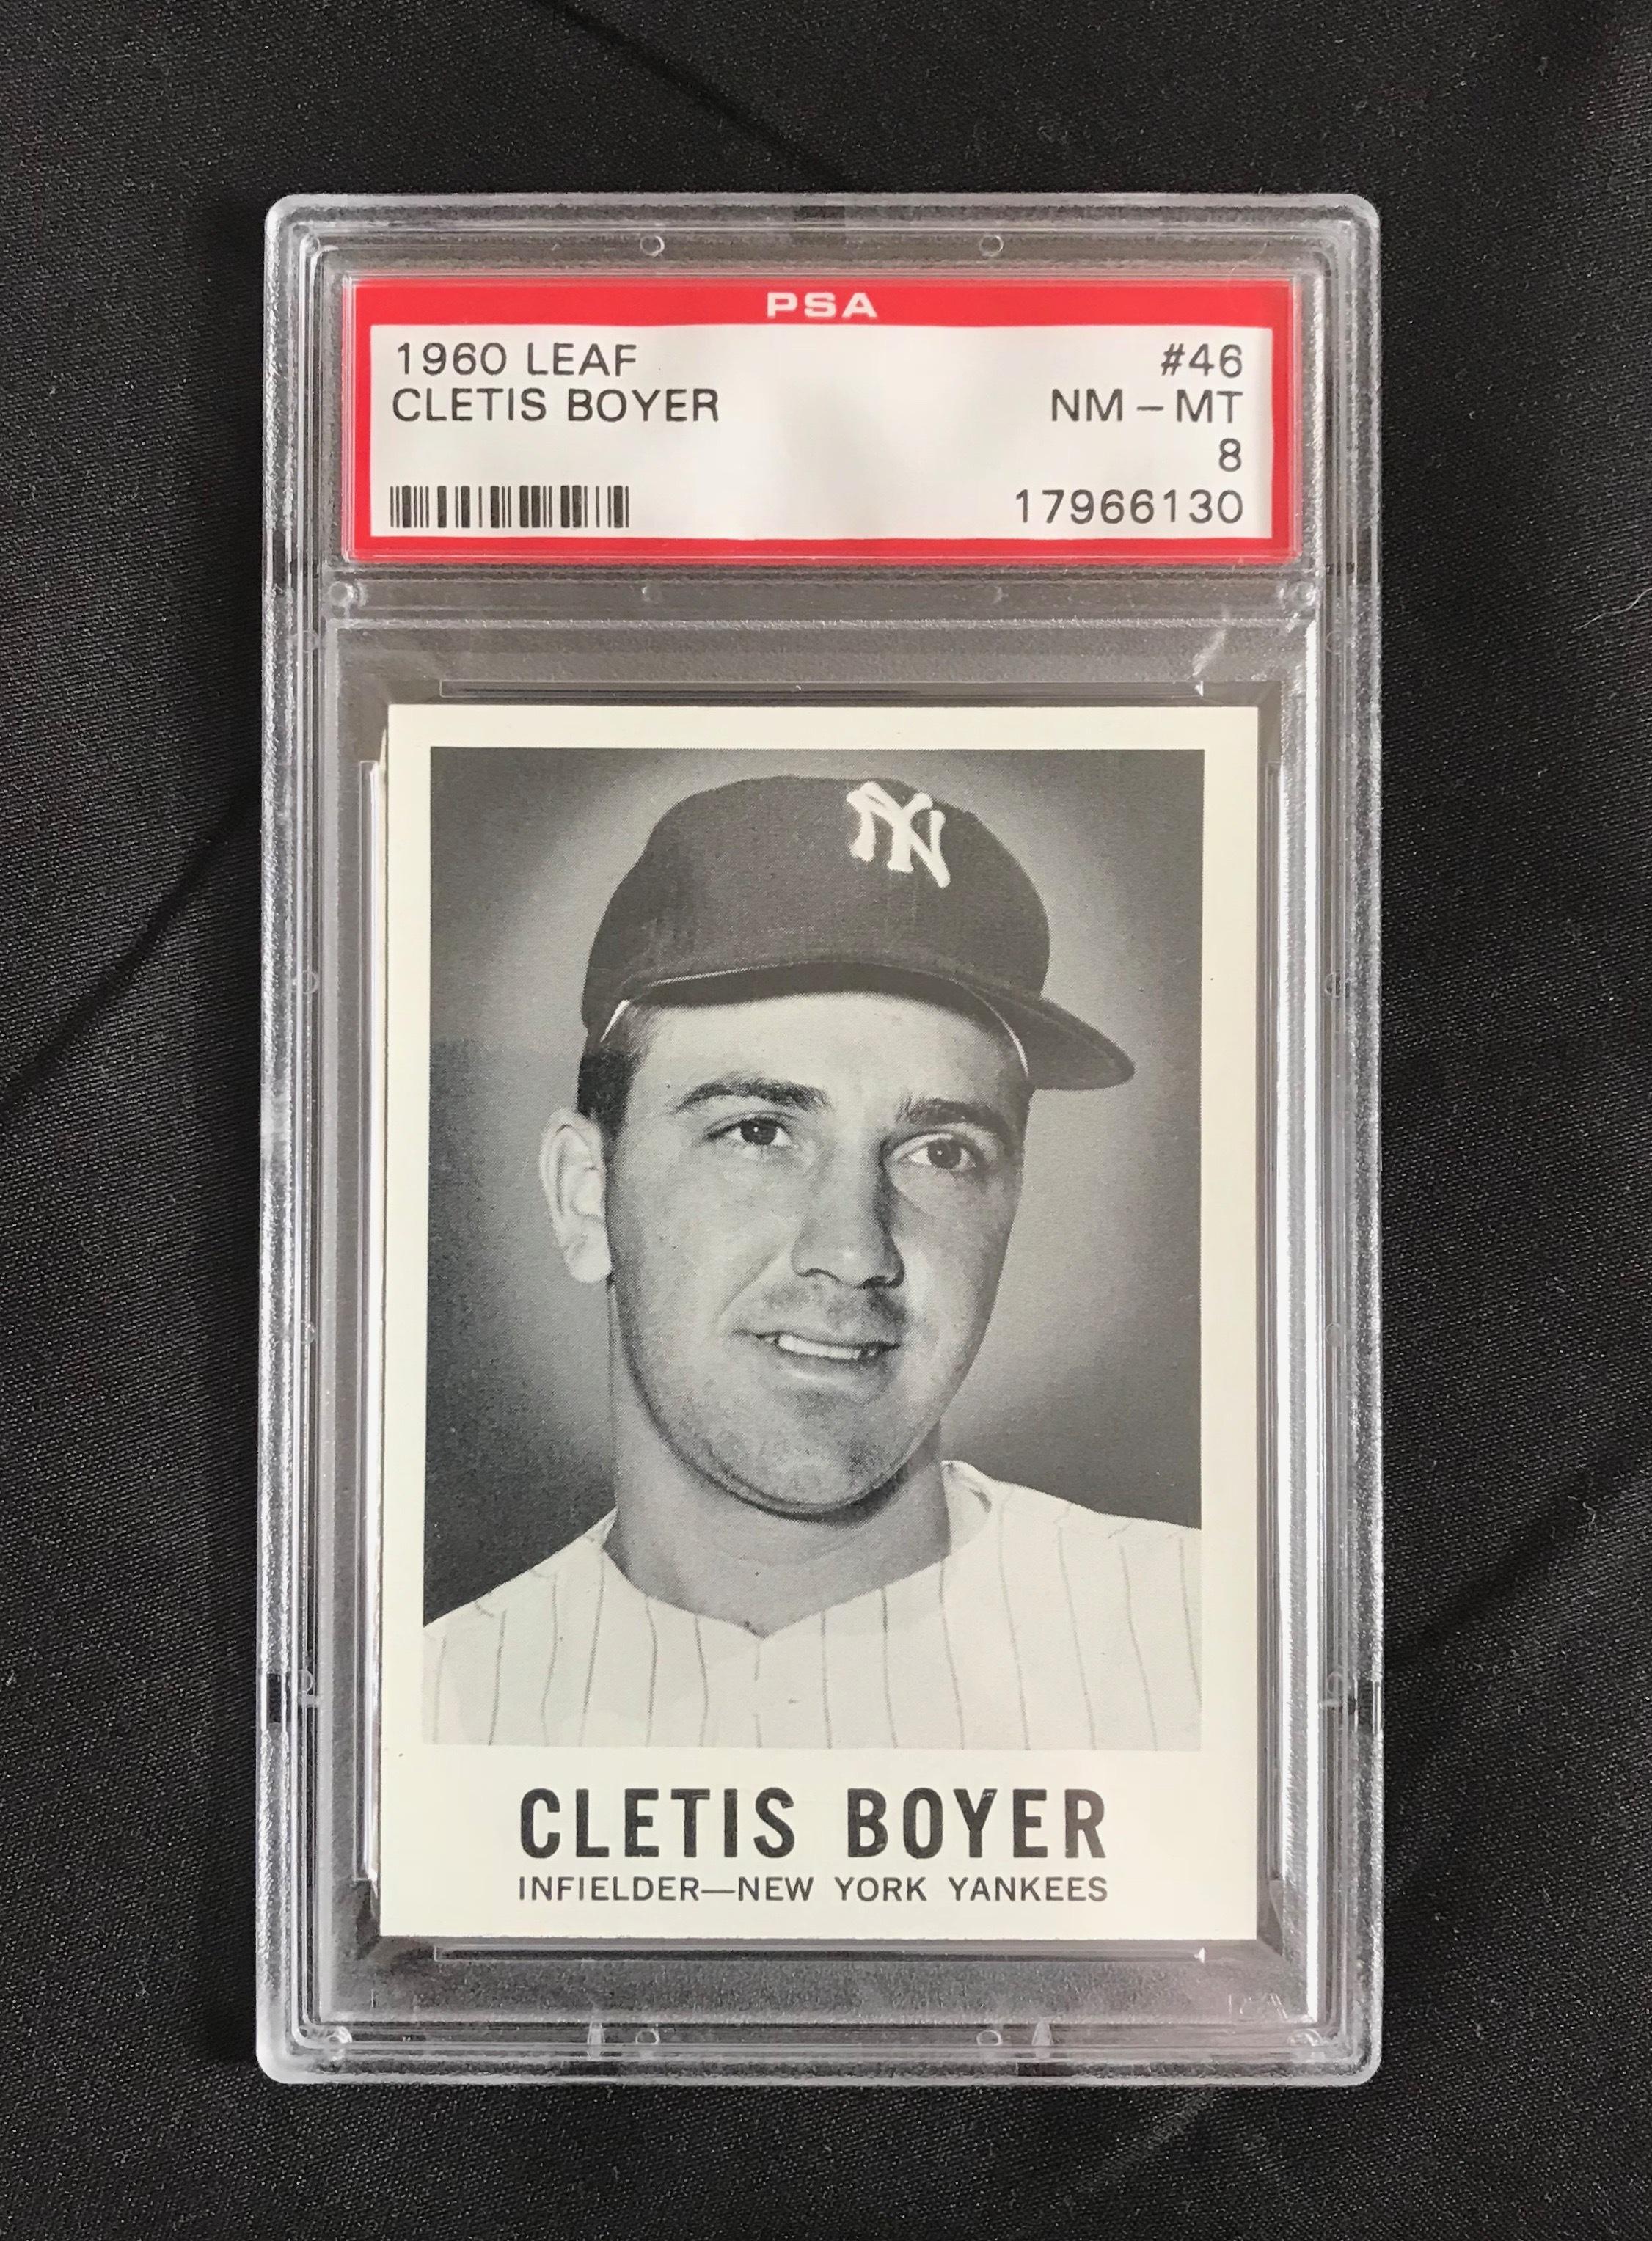 1960 Leaf Cletis Boyer #46 Baseball Card PSA 8